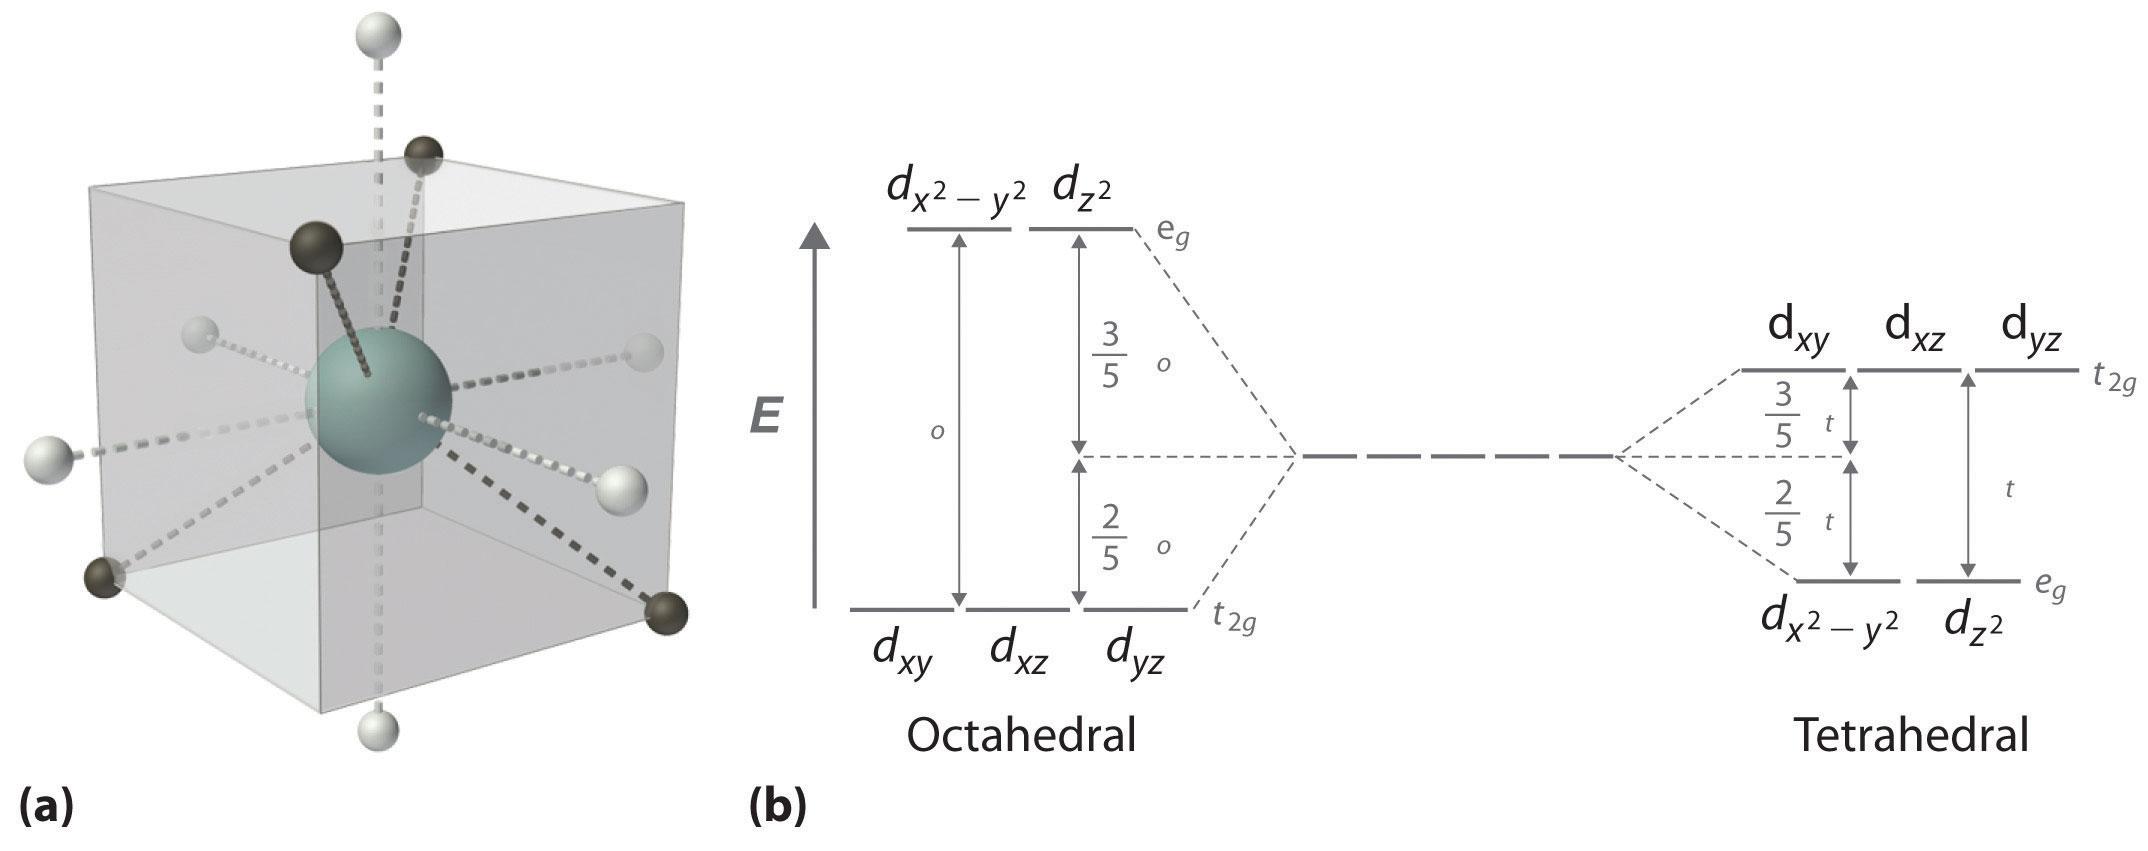 O2 molecular orbital diagram o2 molecular orbital diagram draw energy level diagrams this is the same diagram as the d block elements pooptronica Gallery